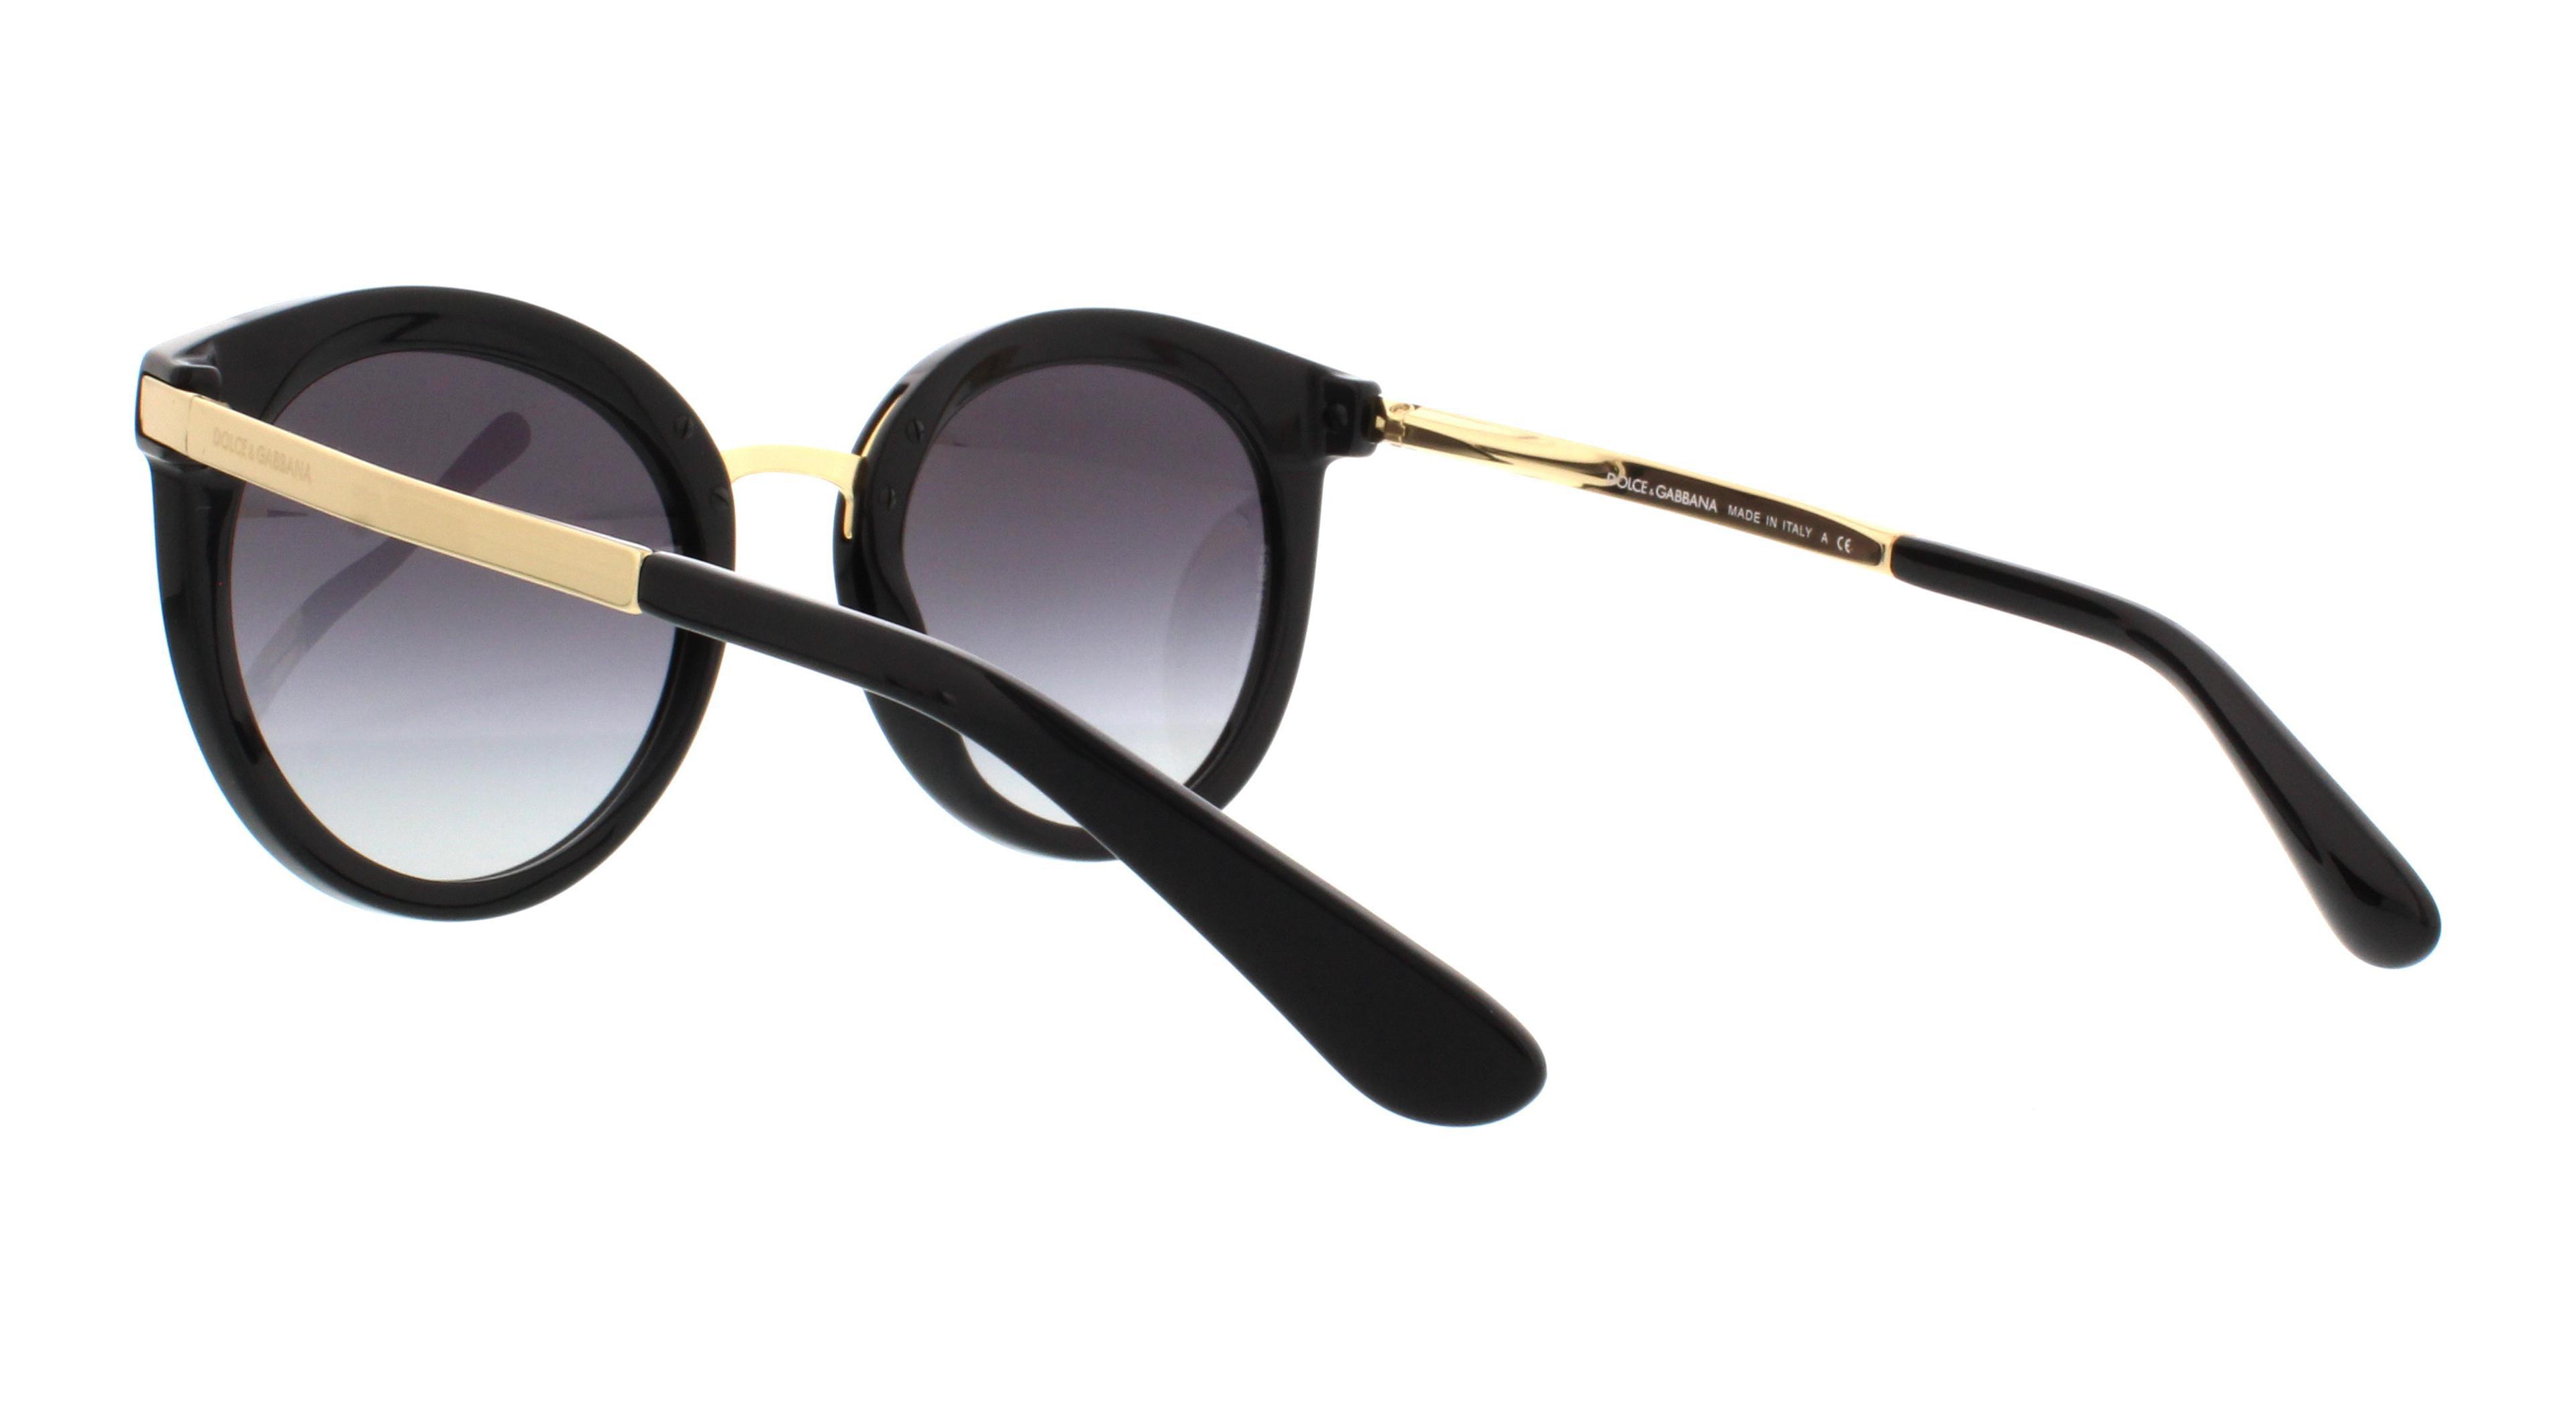 82acb8aaa159 Dolce   Gabbana - Dolce   Gabbana Women s Gradient DG4268-502 13-52 Brown  Round Sunglasses - Walmart.com